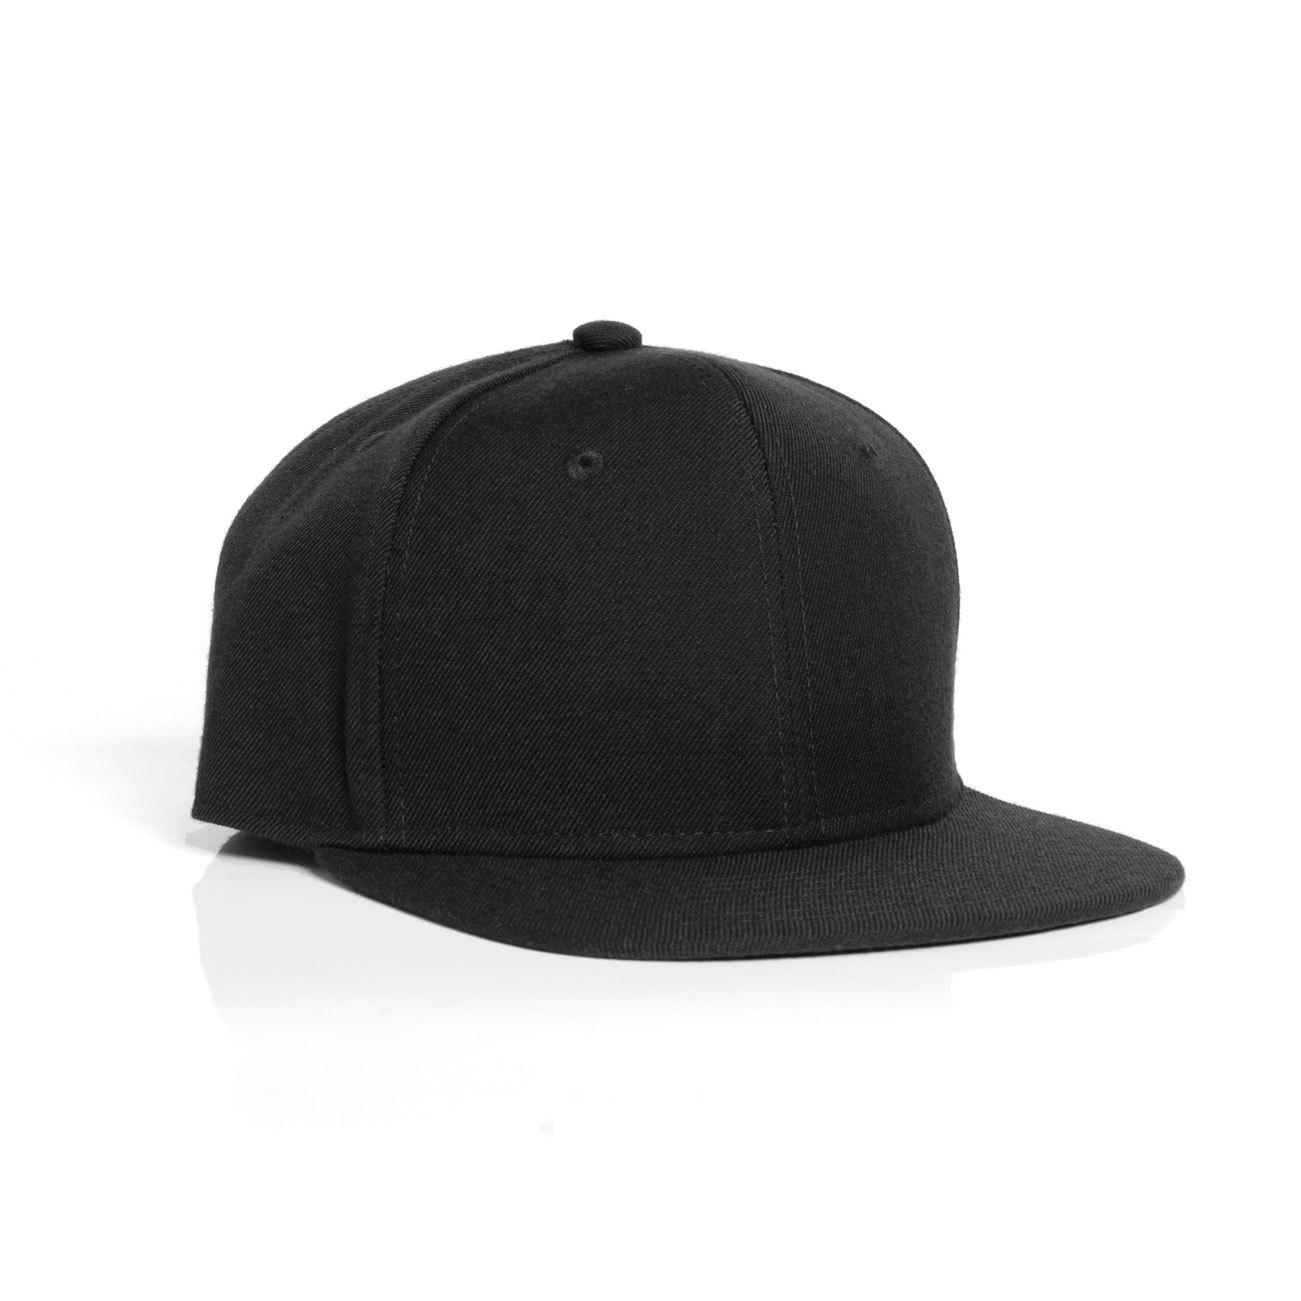 TRIM SNAPBACK CAP - BLACK - Nublank Caps a550caf3f70